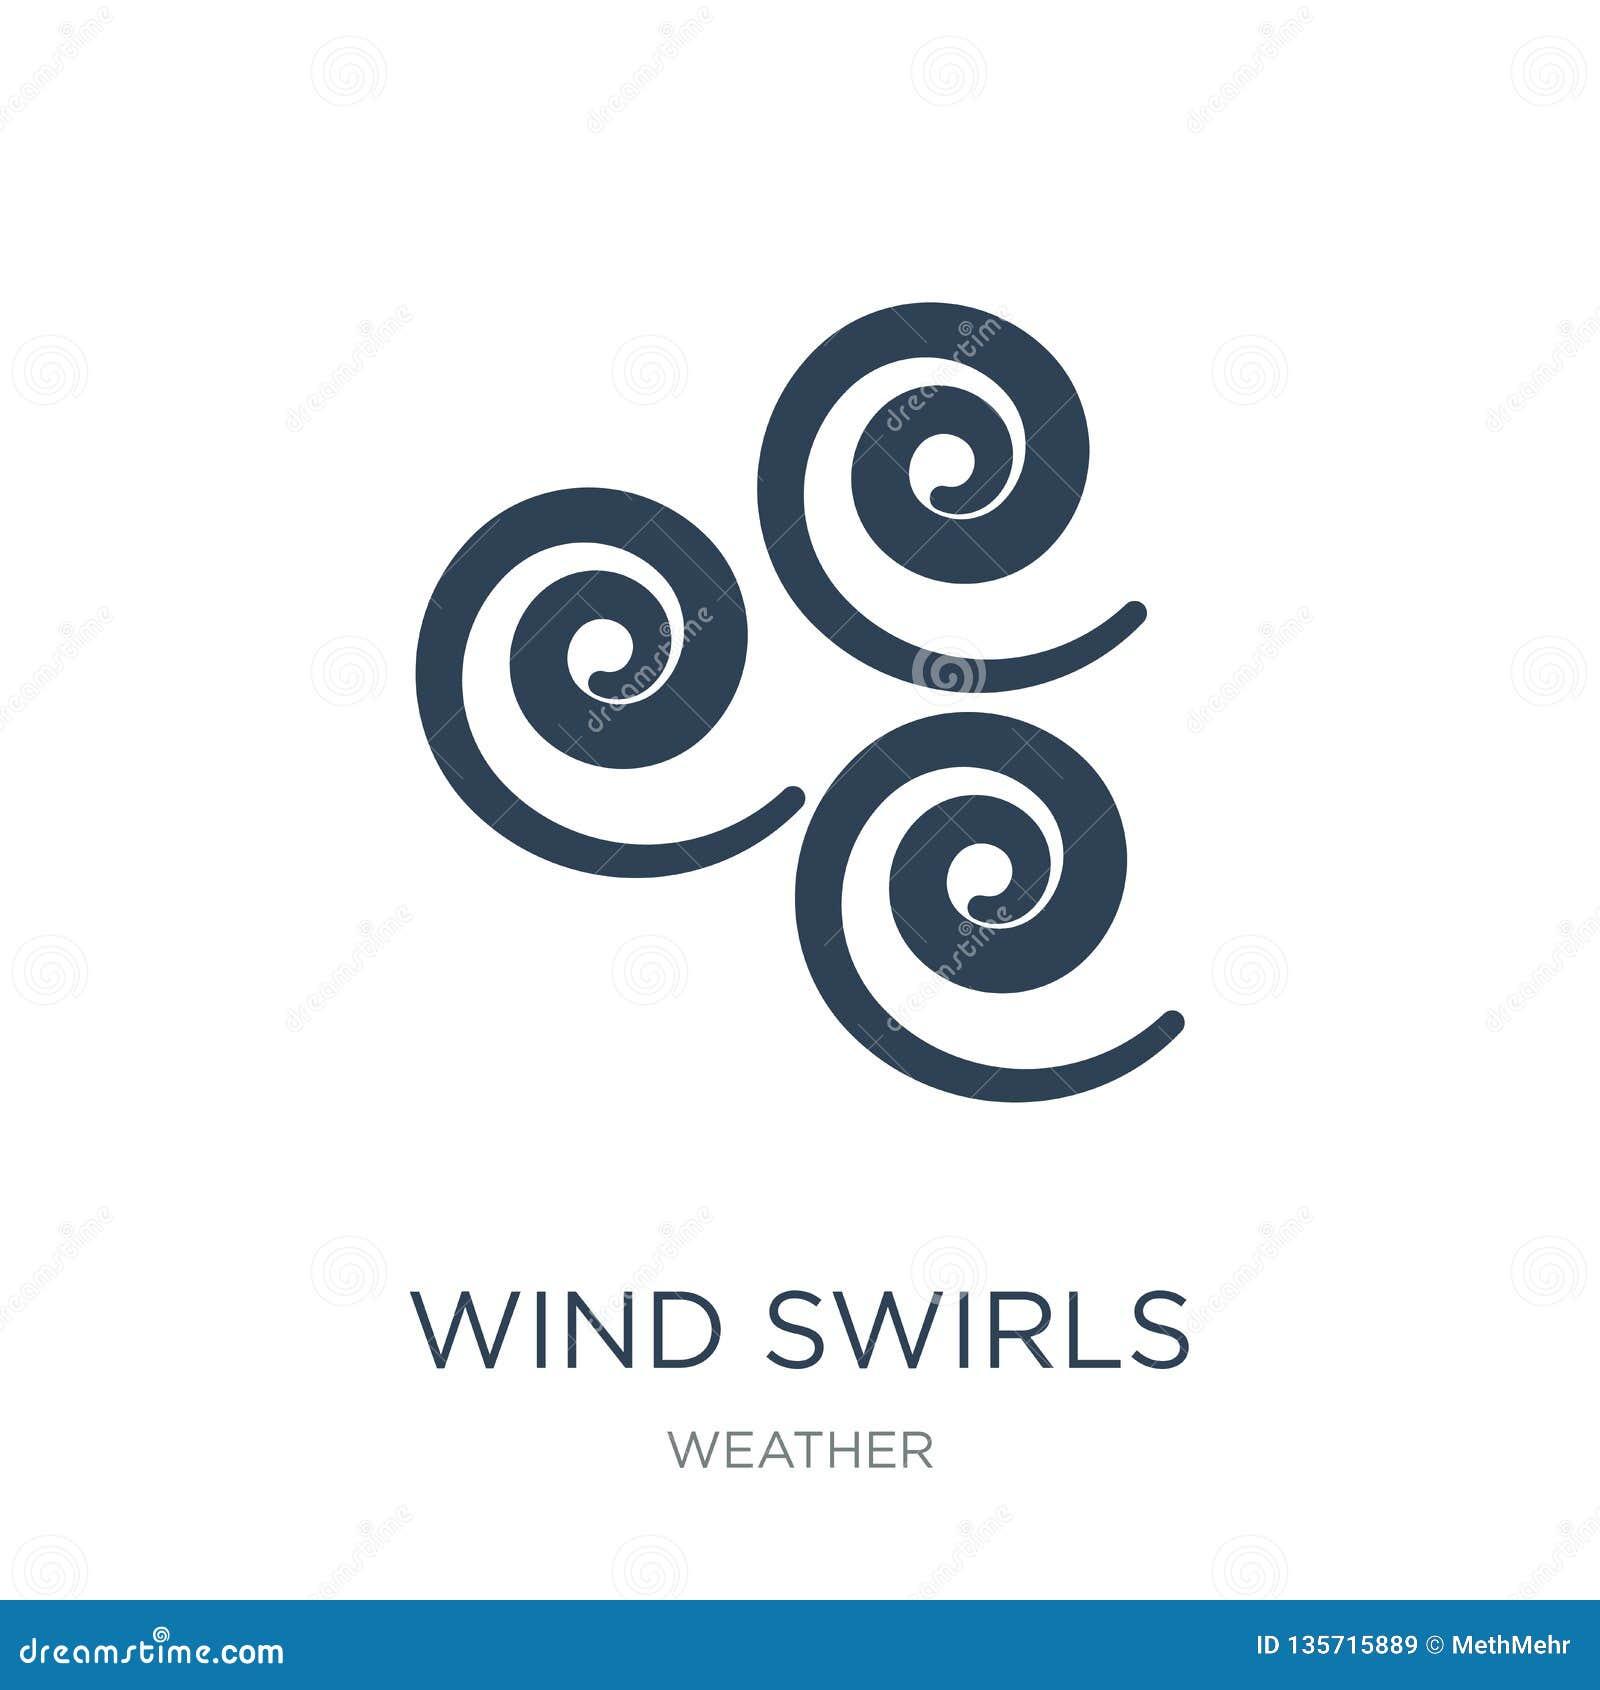 wind swirls icon in trendy design style. wind swirls icon isolated on white background. wind swirls vector icon simple and modern